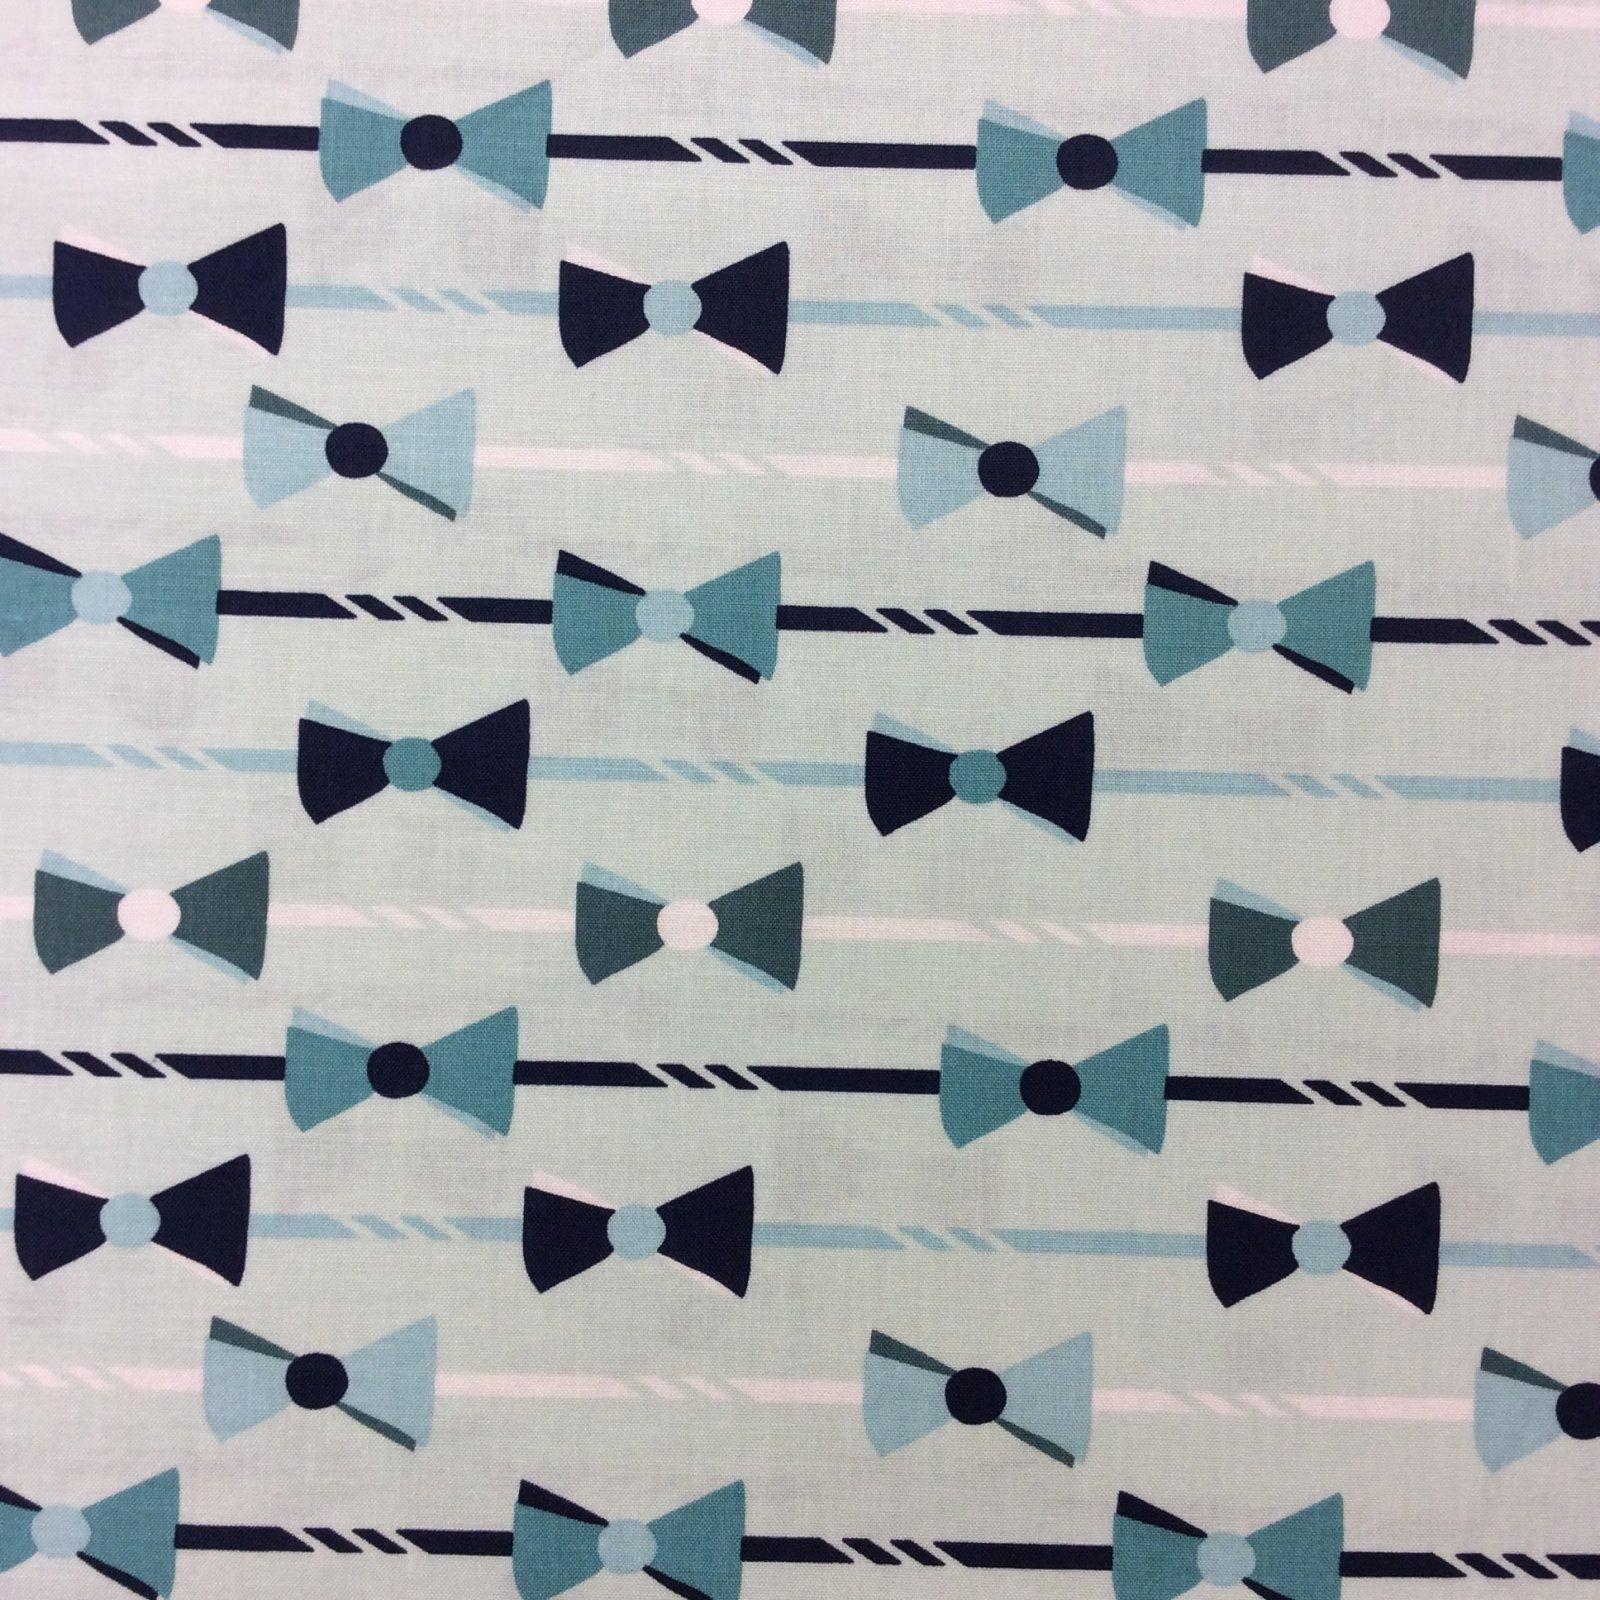 Riley Blake Seafoam Green Dapper Bow Ties Bowtie Preppy Quilt Cotton Quilting Fabric RB57